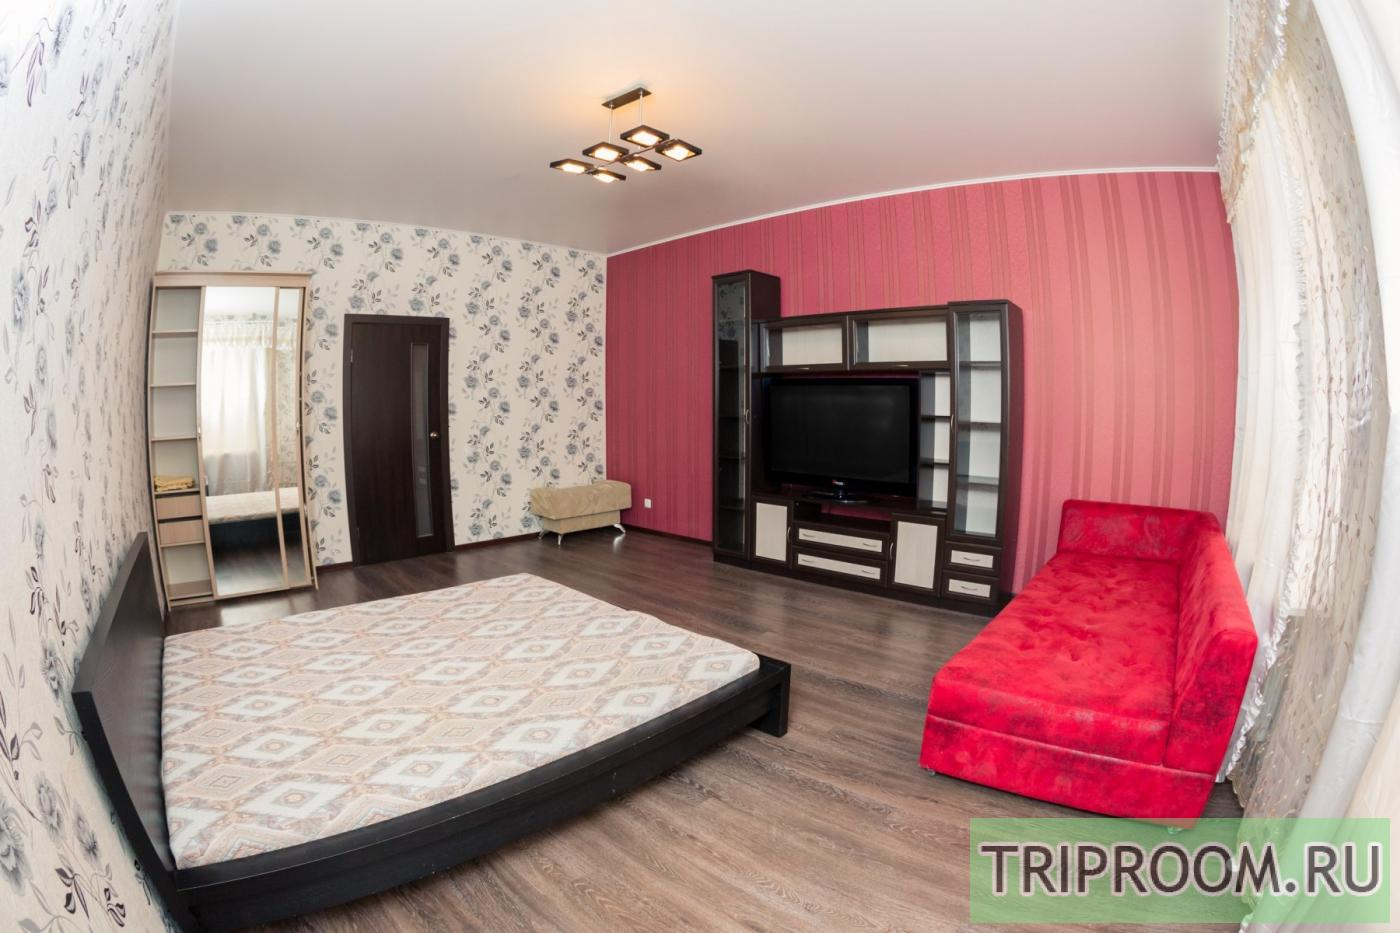 2-комнатная квартира посуточно (вариант № 33340), ул. Виленский переулок, фото № 1